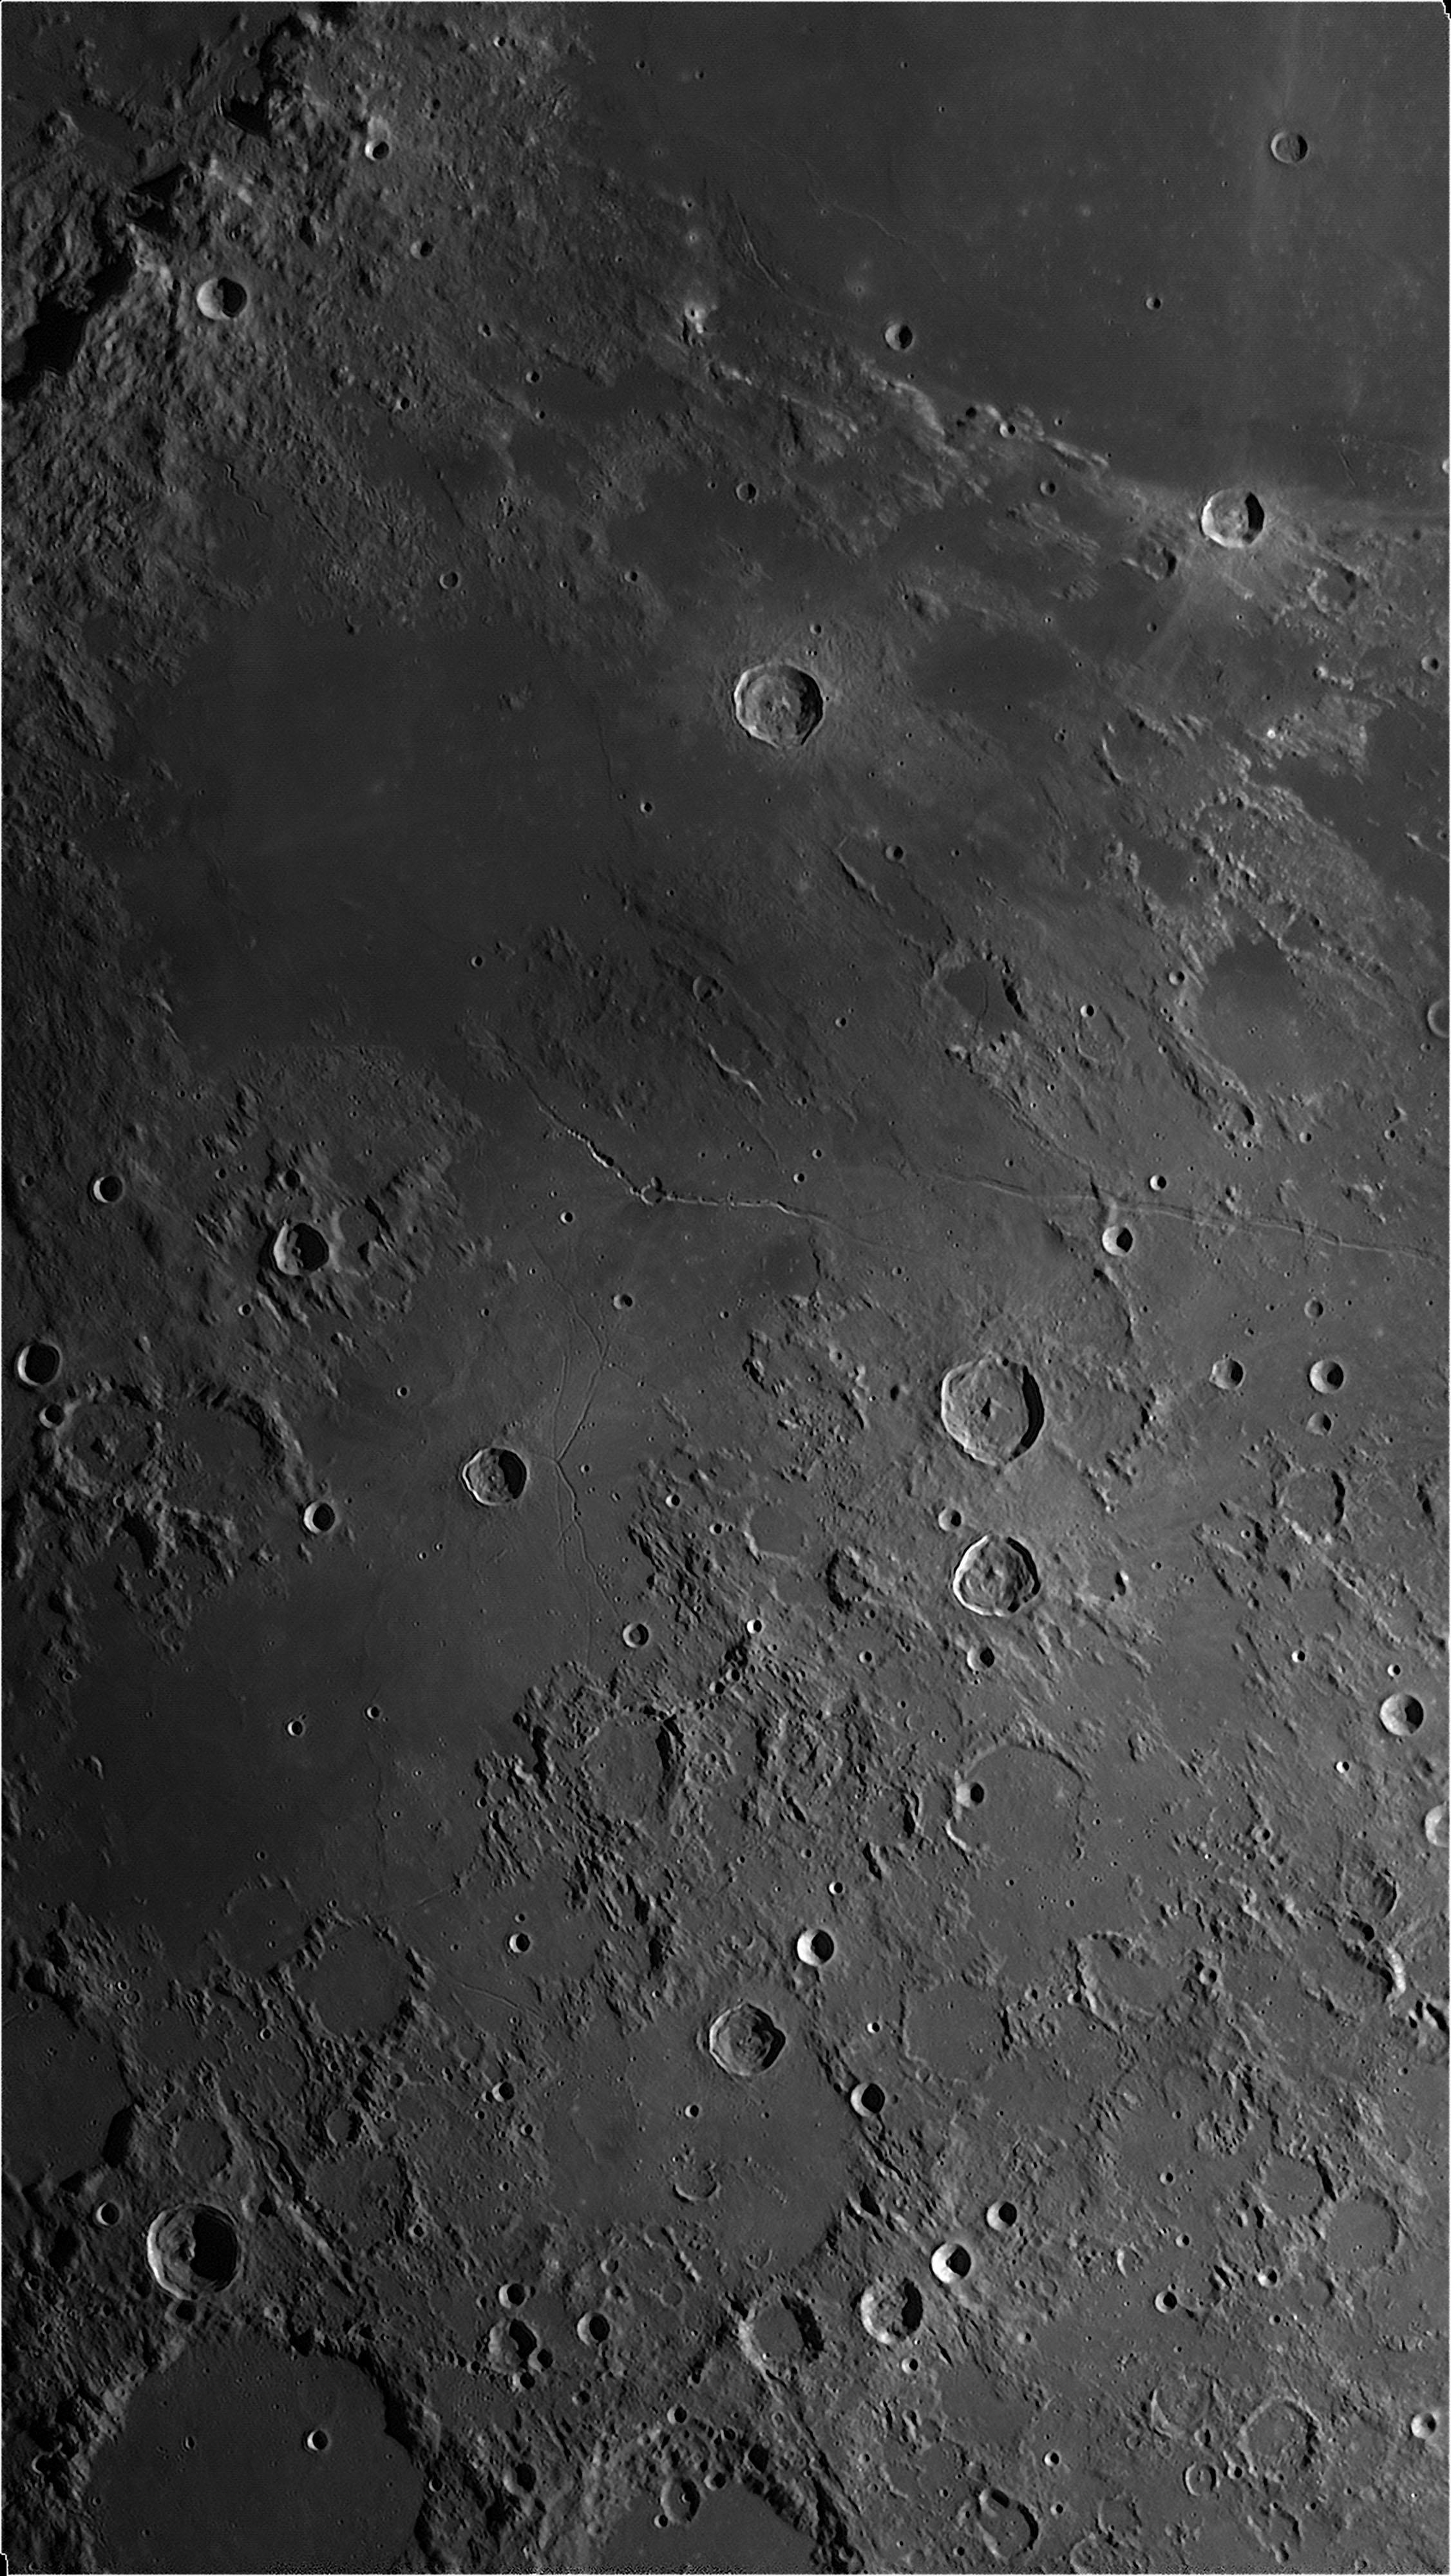 2019-07-10-1815_1_lapl5_ap2547.jpg